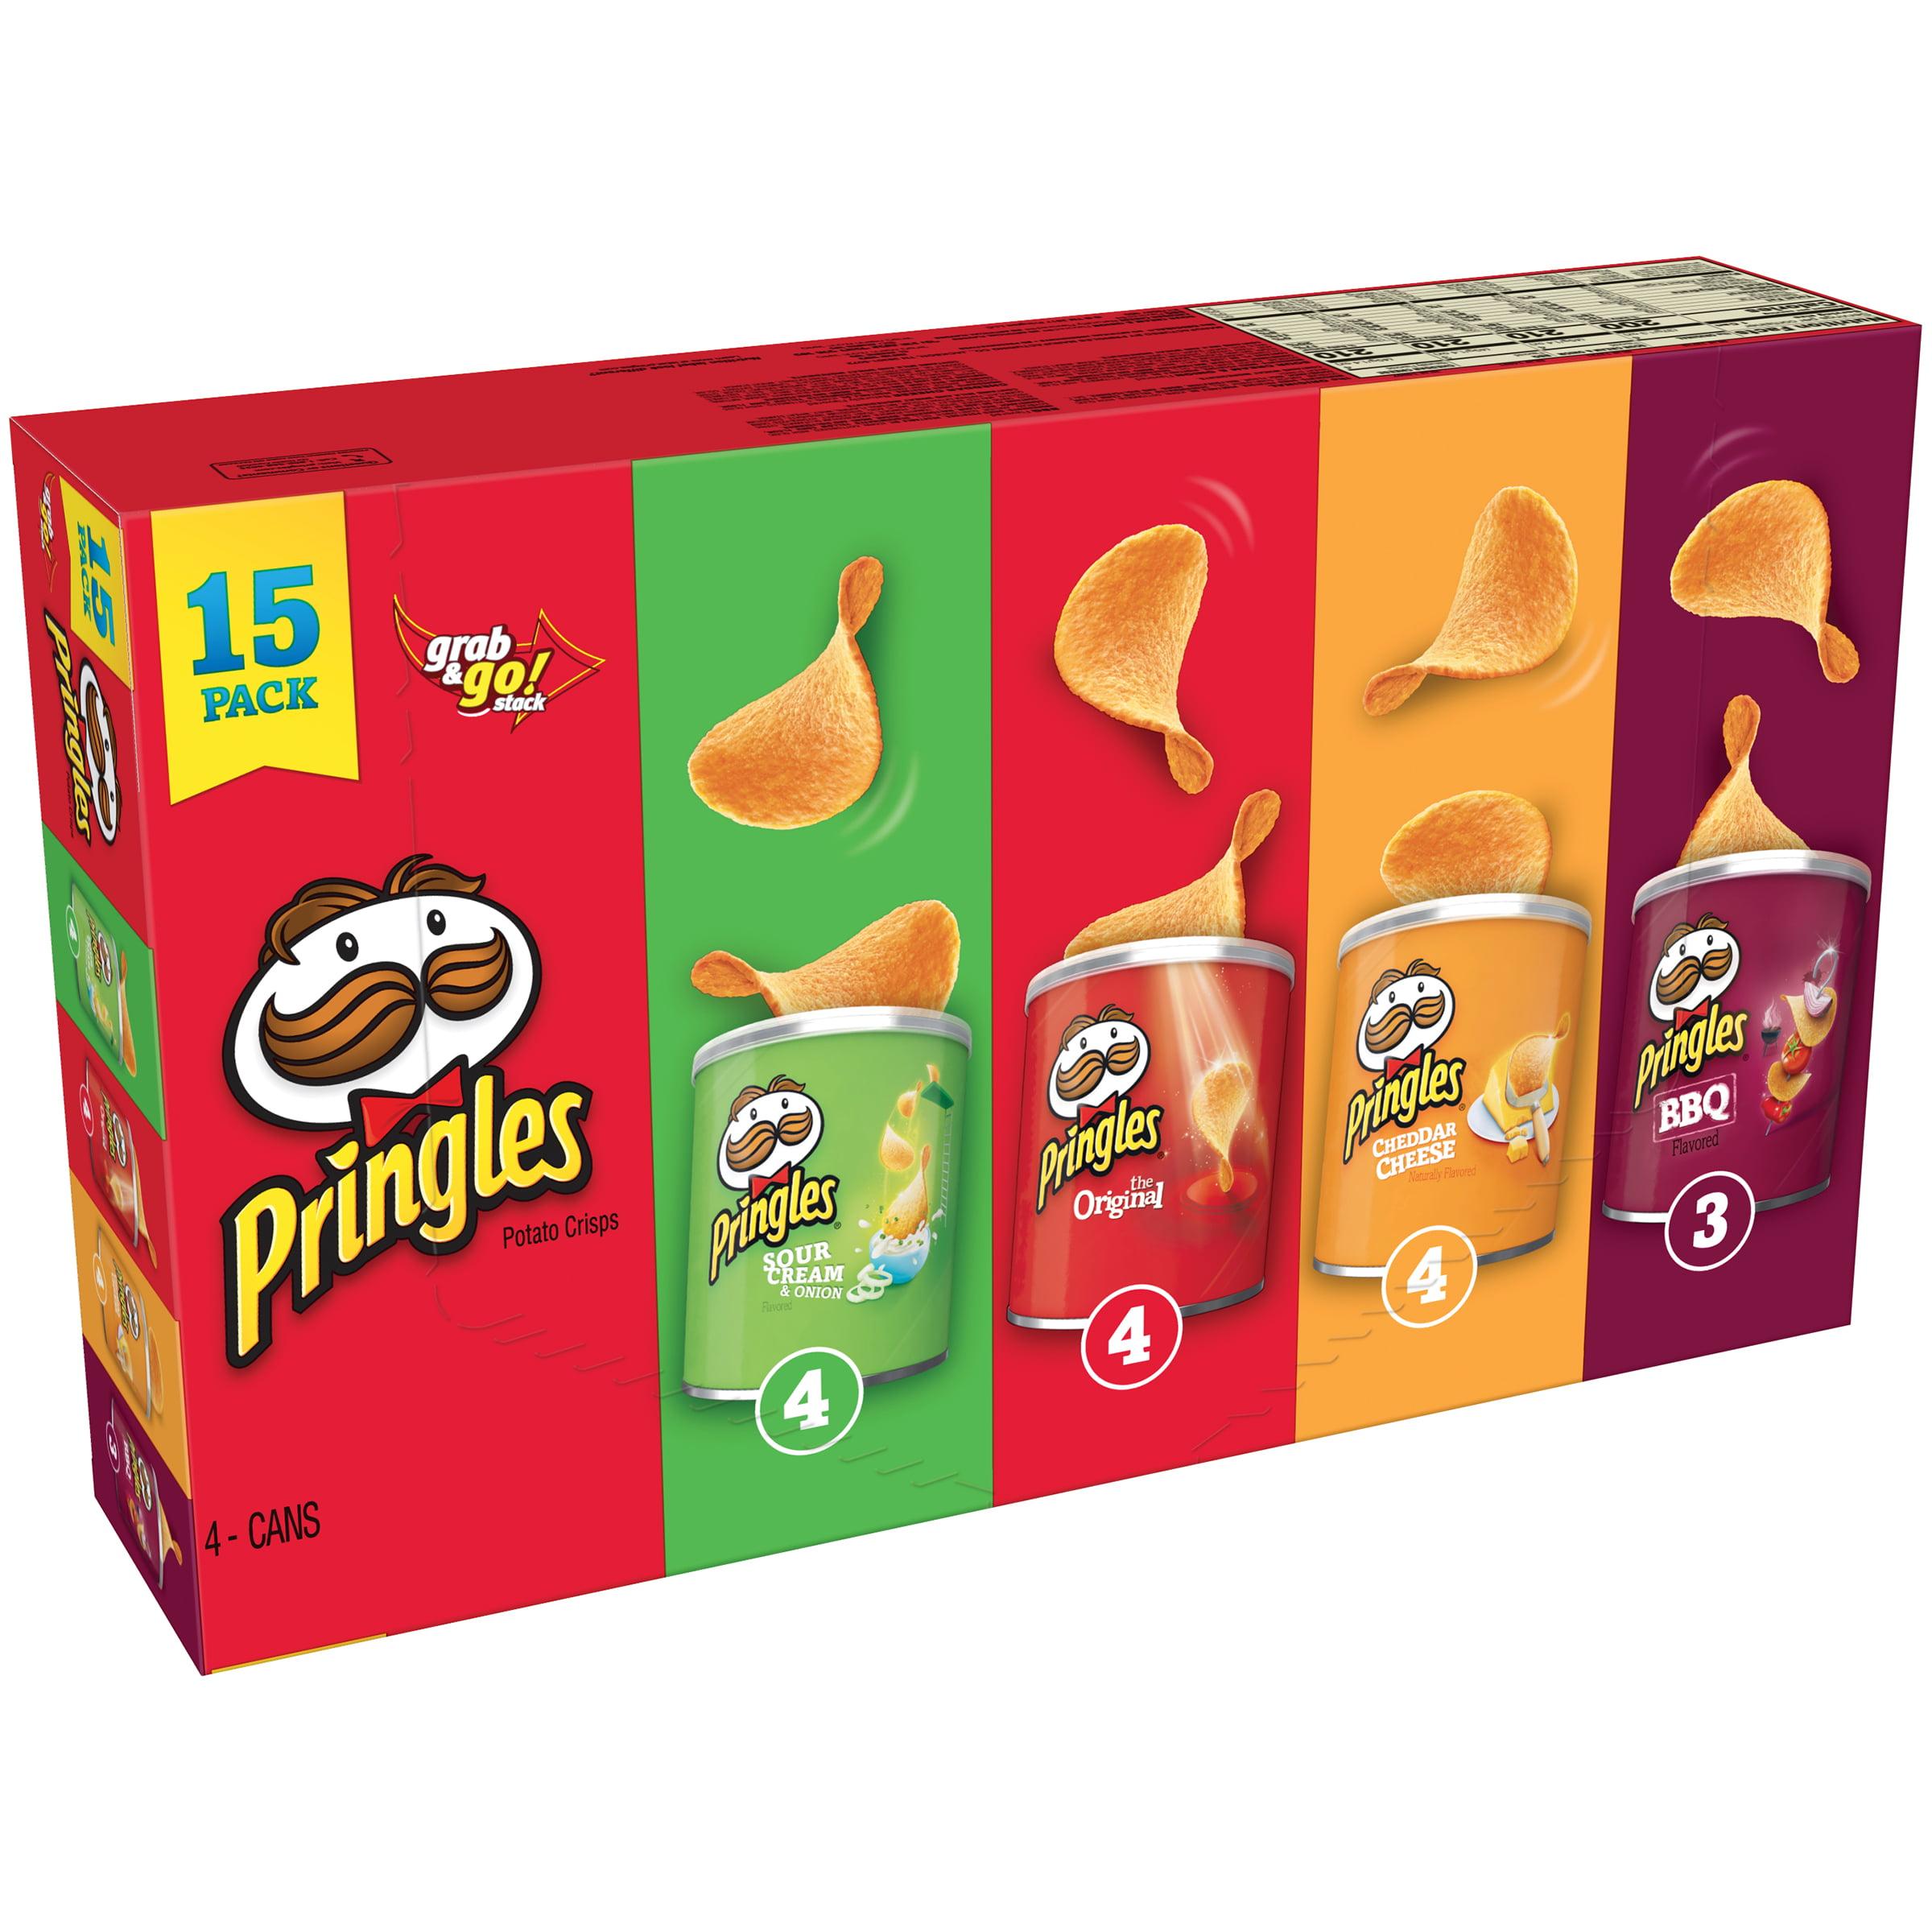 Pringles Sour Cream & Onion, The Original, Cheddar Cheese & BBQ Potato Crisps Variety Pack 15 Ct 20.6 oz